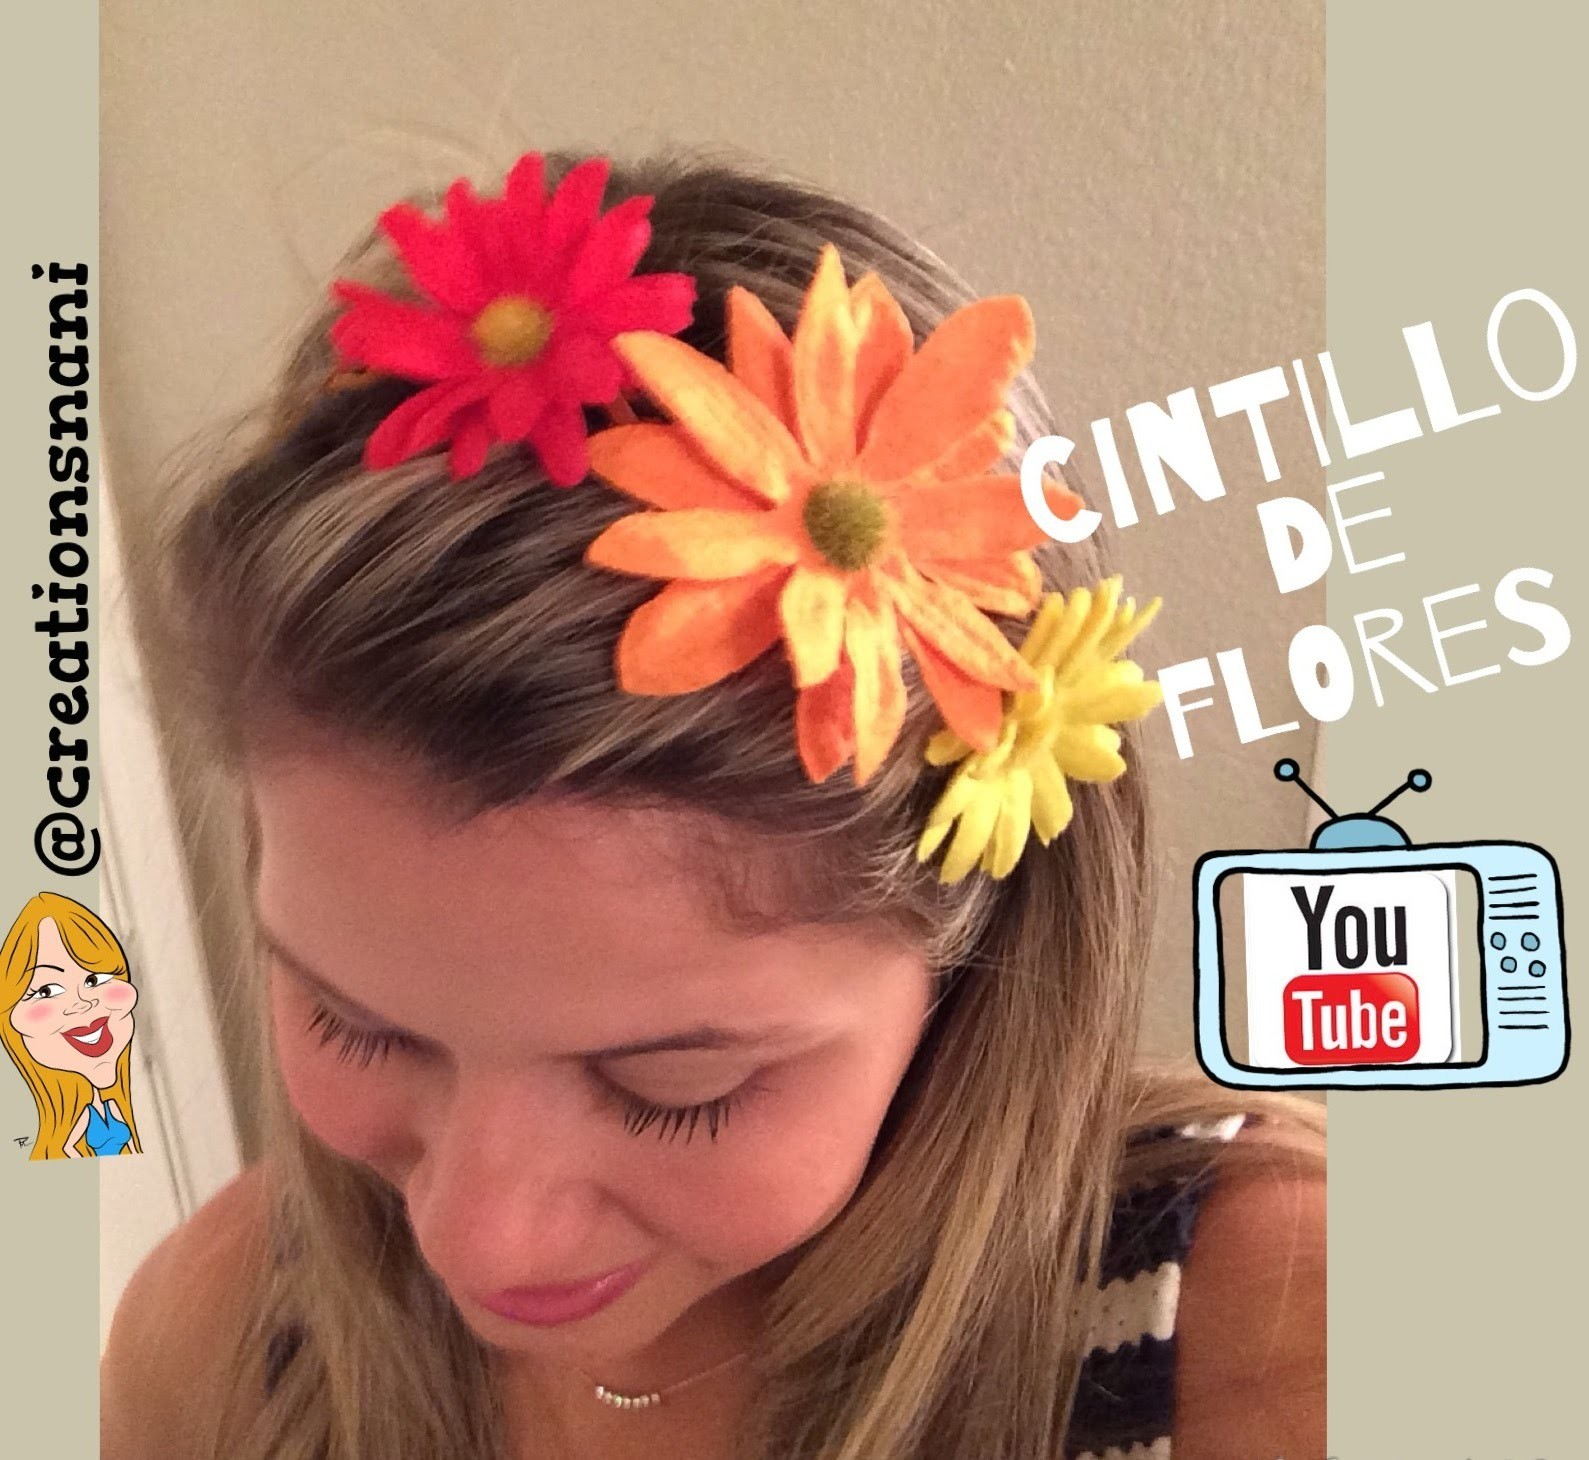 Cintillo de flores - Flower Headbands | Creations Nani